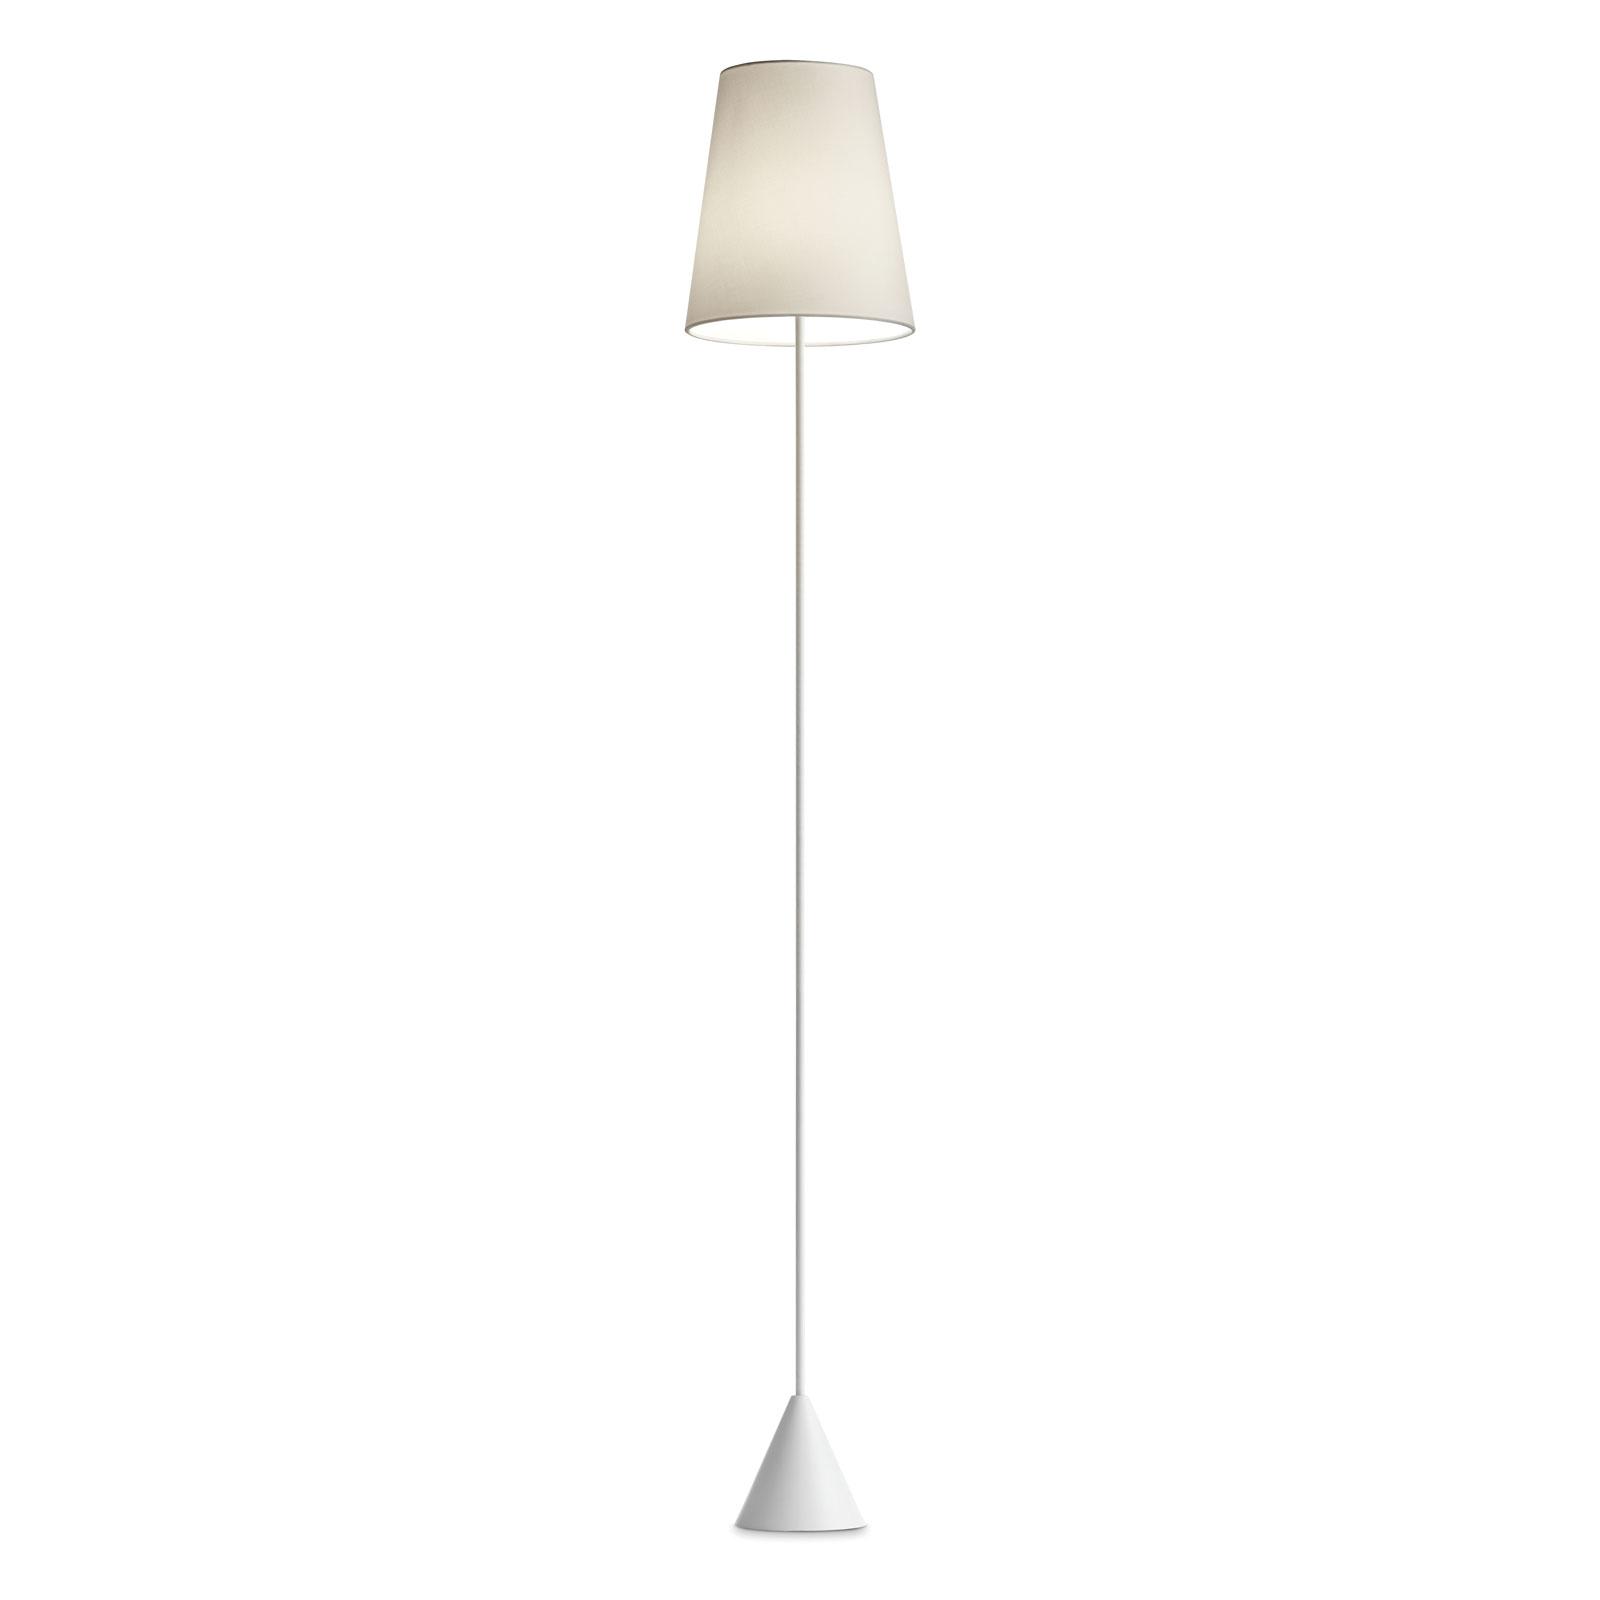 Modo Luce Lucilla vloerlamp Ø 30cm wit/ivoor